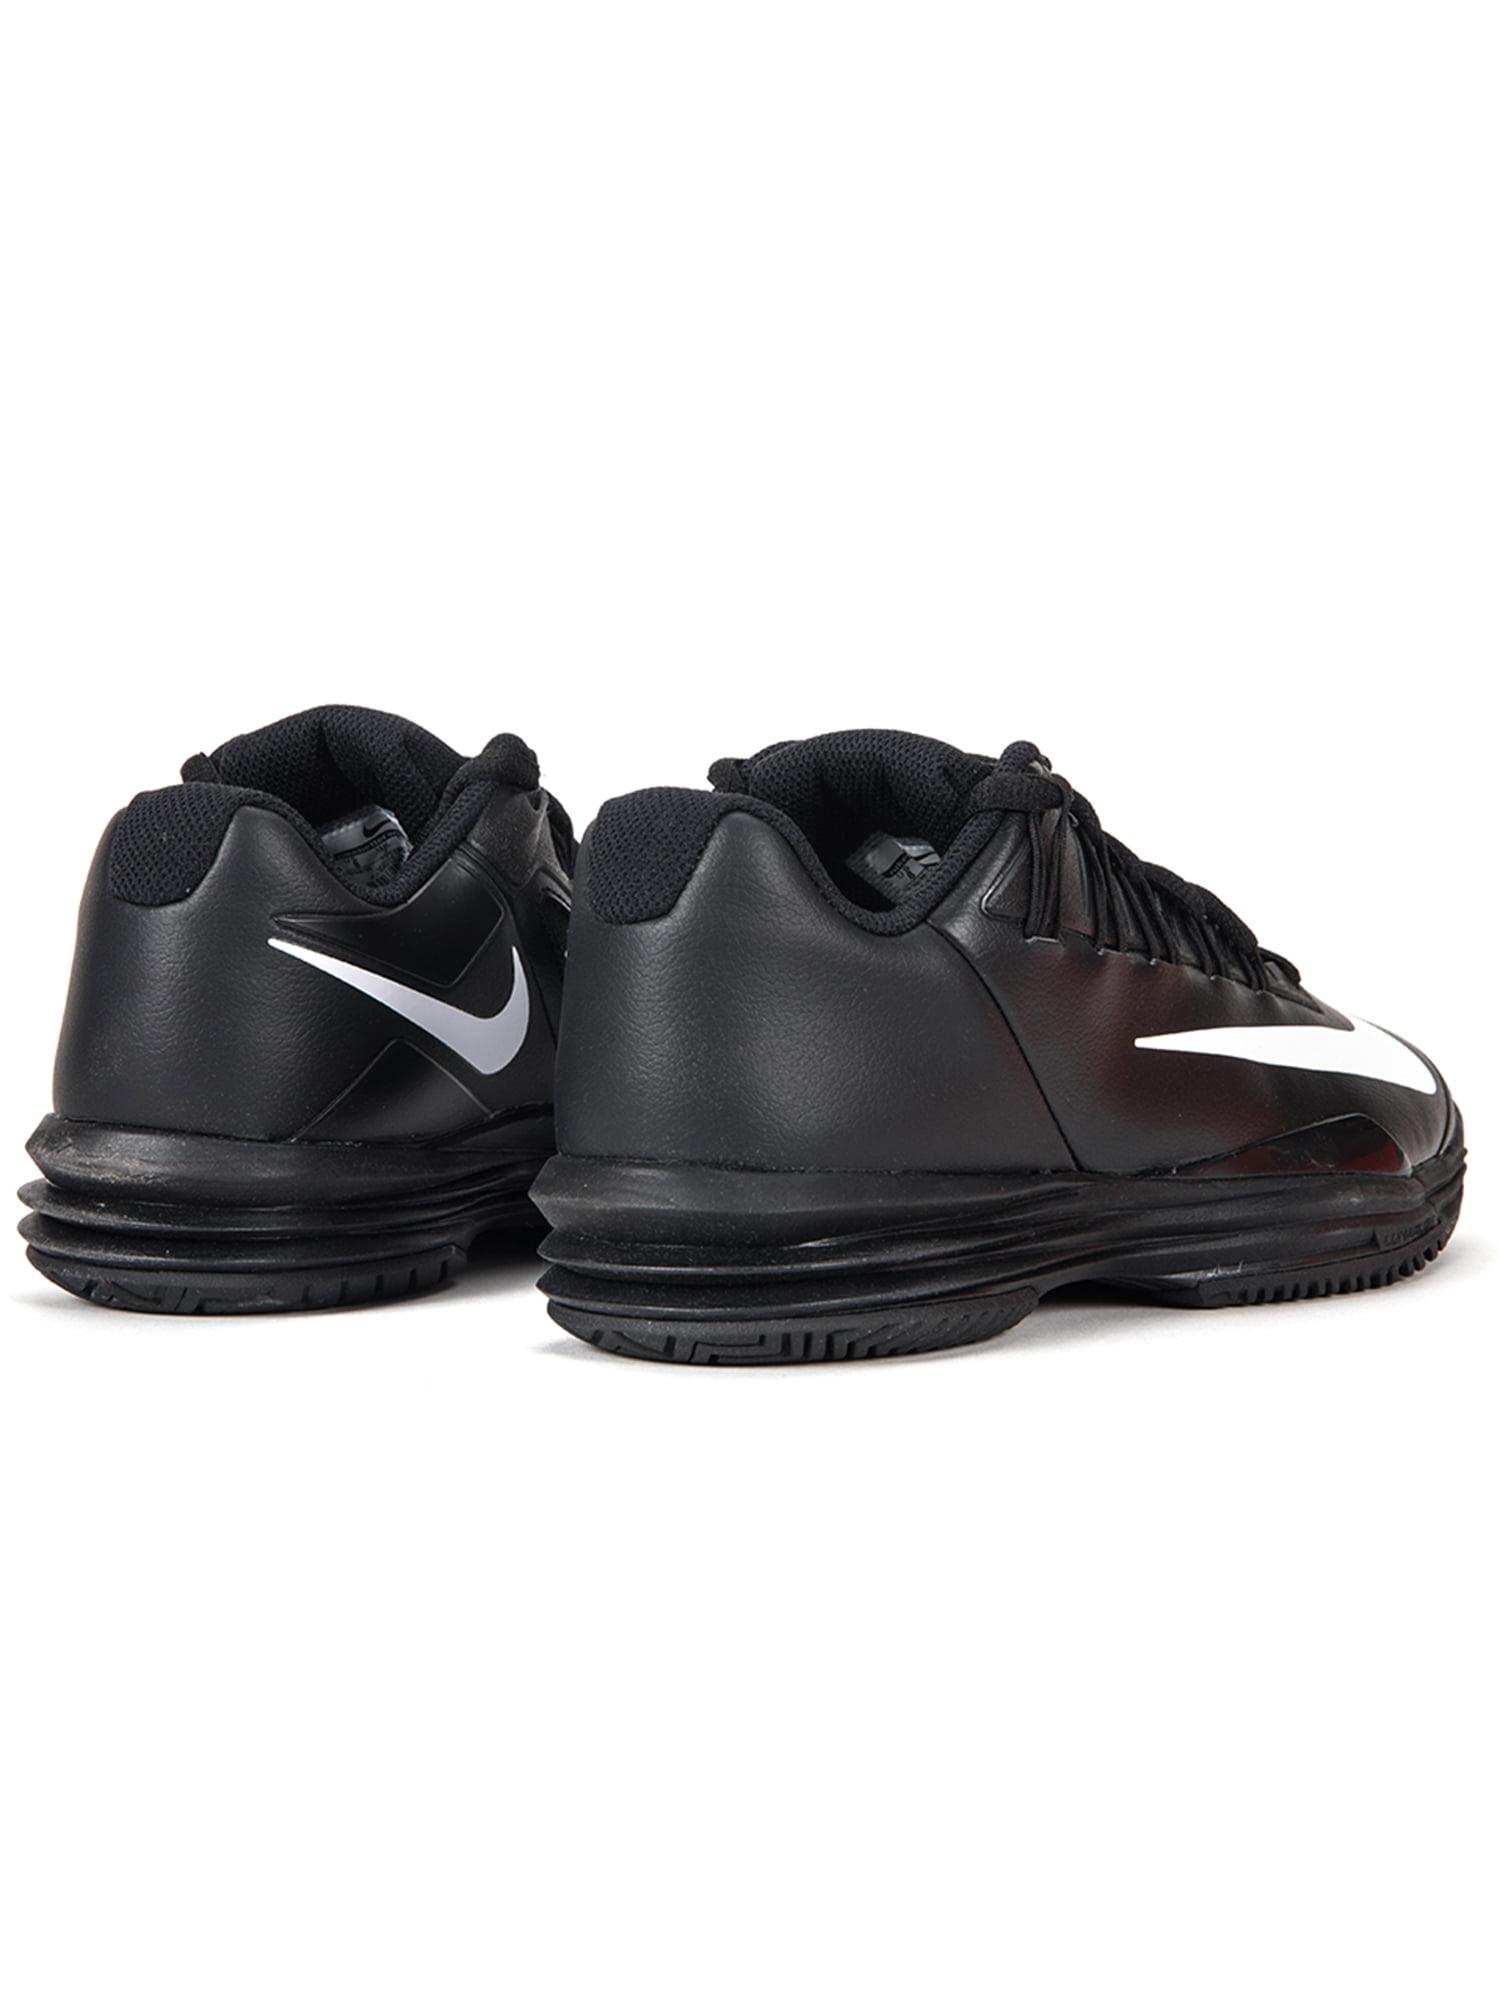 sports shoes 9d5b1 0f6dd Nike - Nike Mens Lunar Ballistec 1.5 Tennis Shoes 705285-001